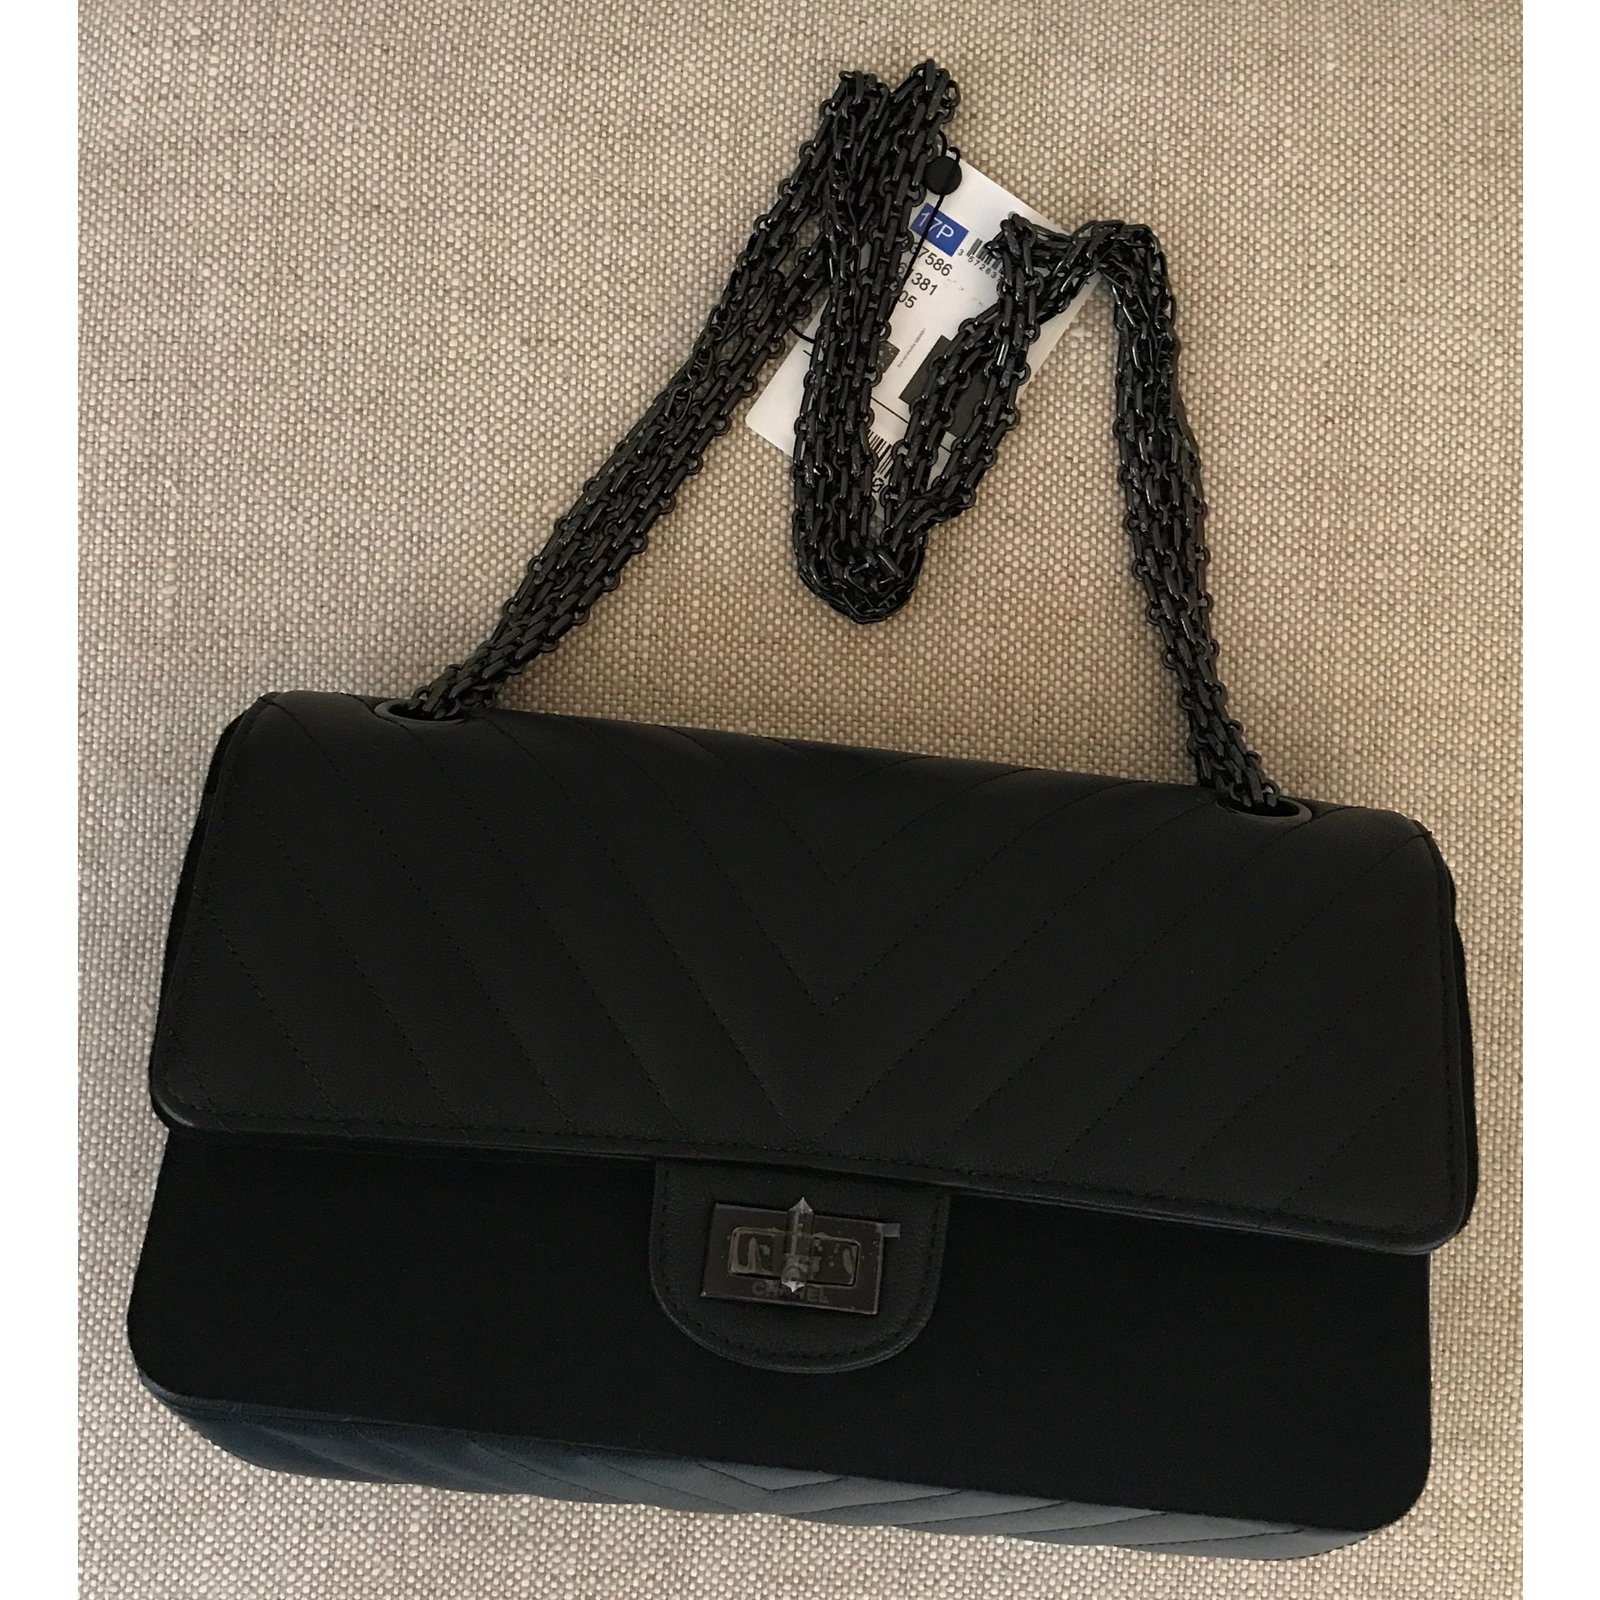 60e314e074d5 Chanel So Black Reissue Chevron 2.55 Double Flap Handbag Limited Edition  Handbags Leather Black ref.65212 - Joli Closet